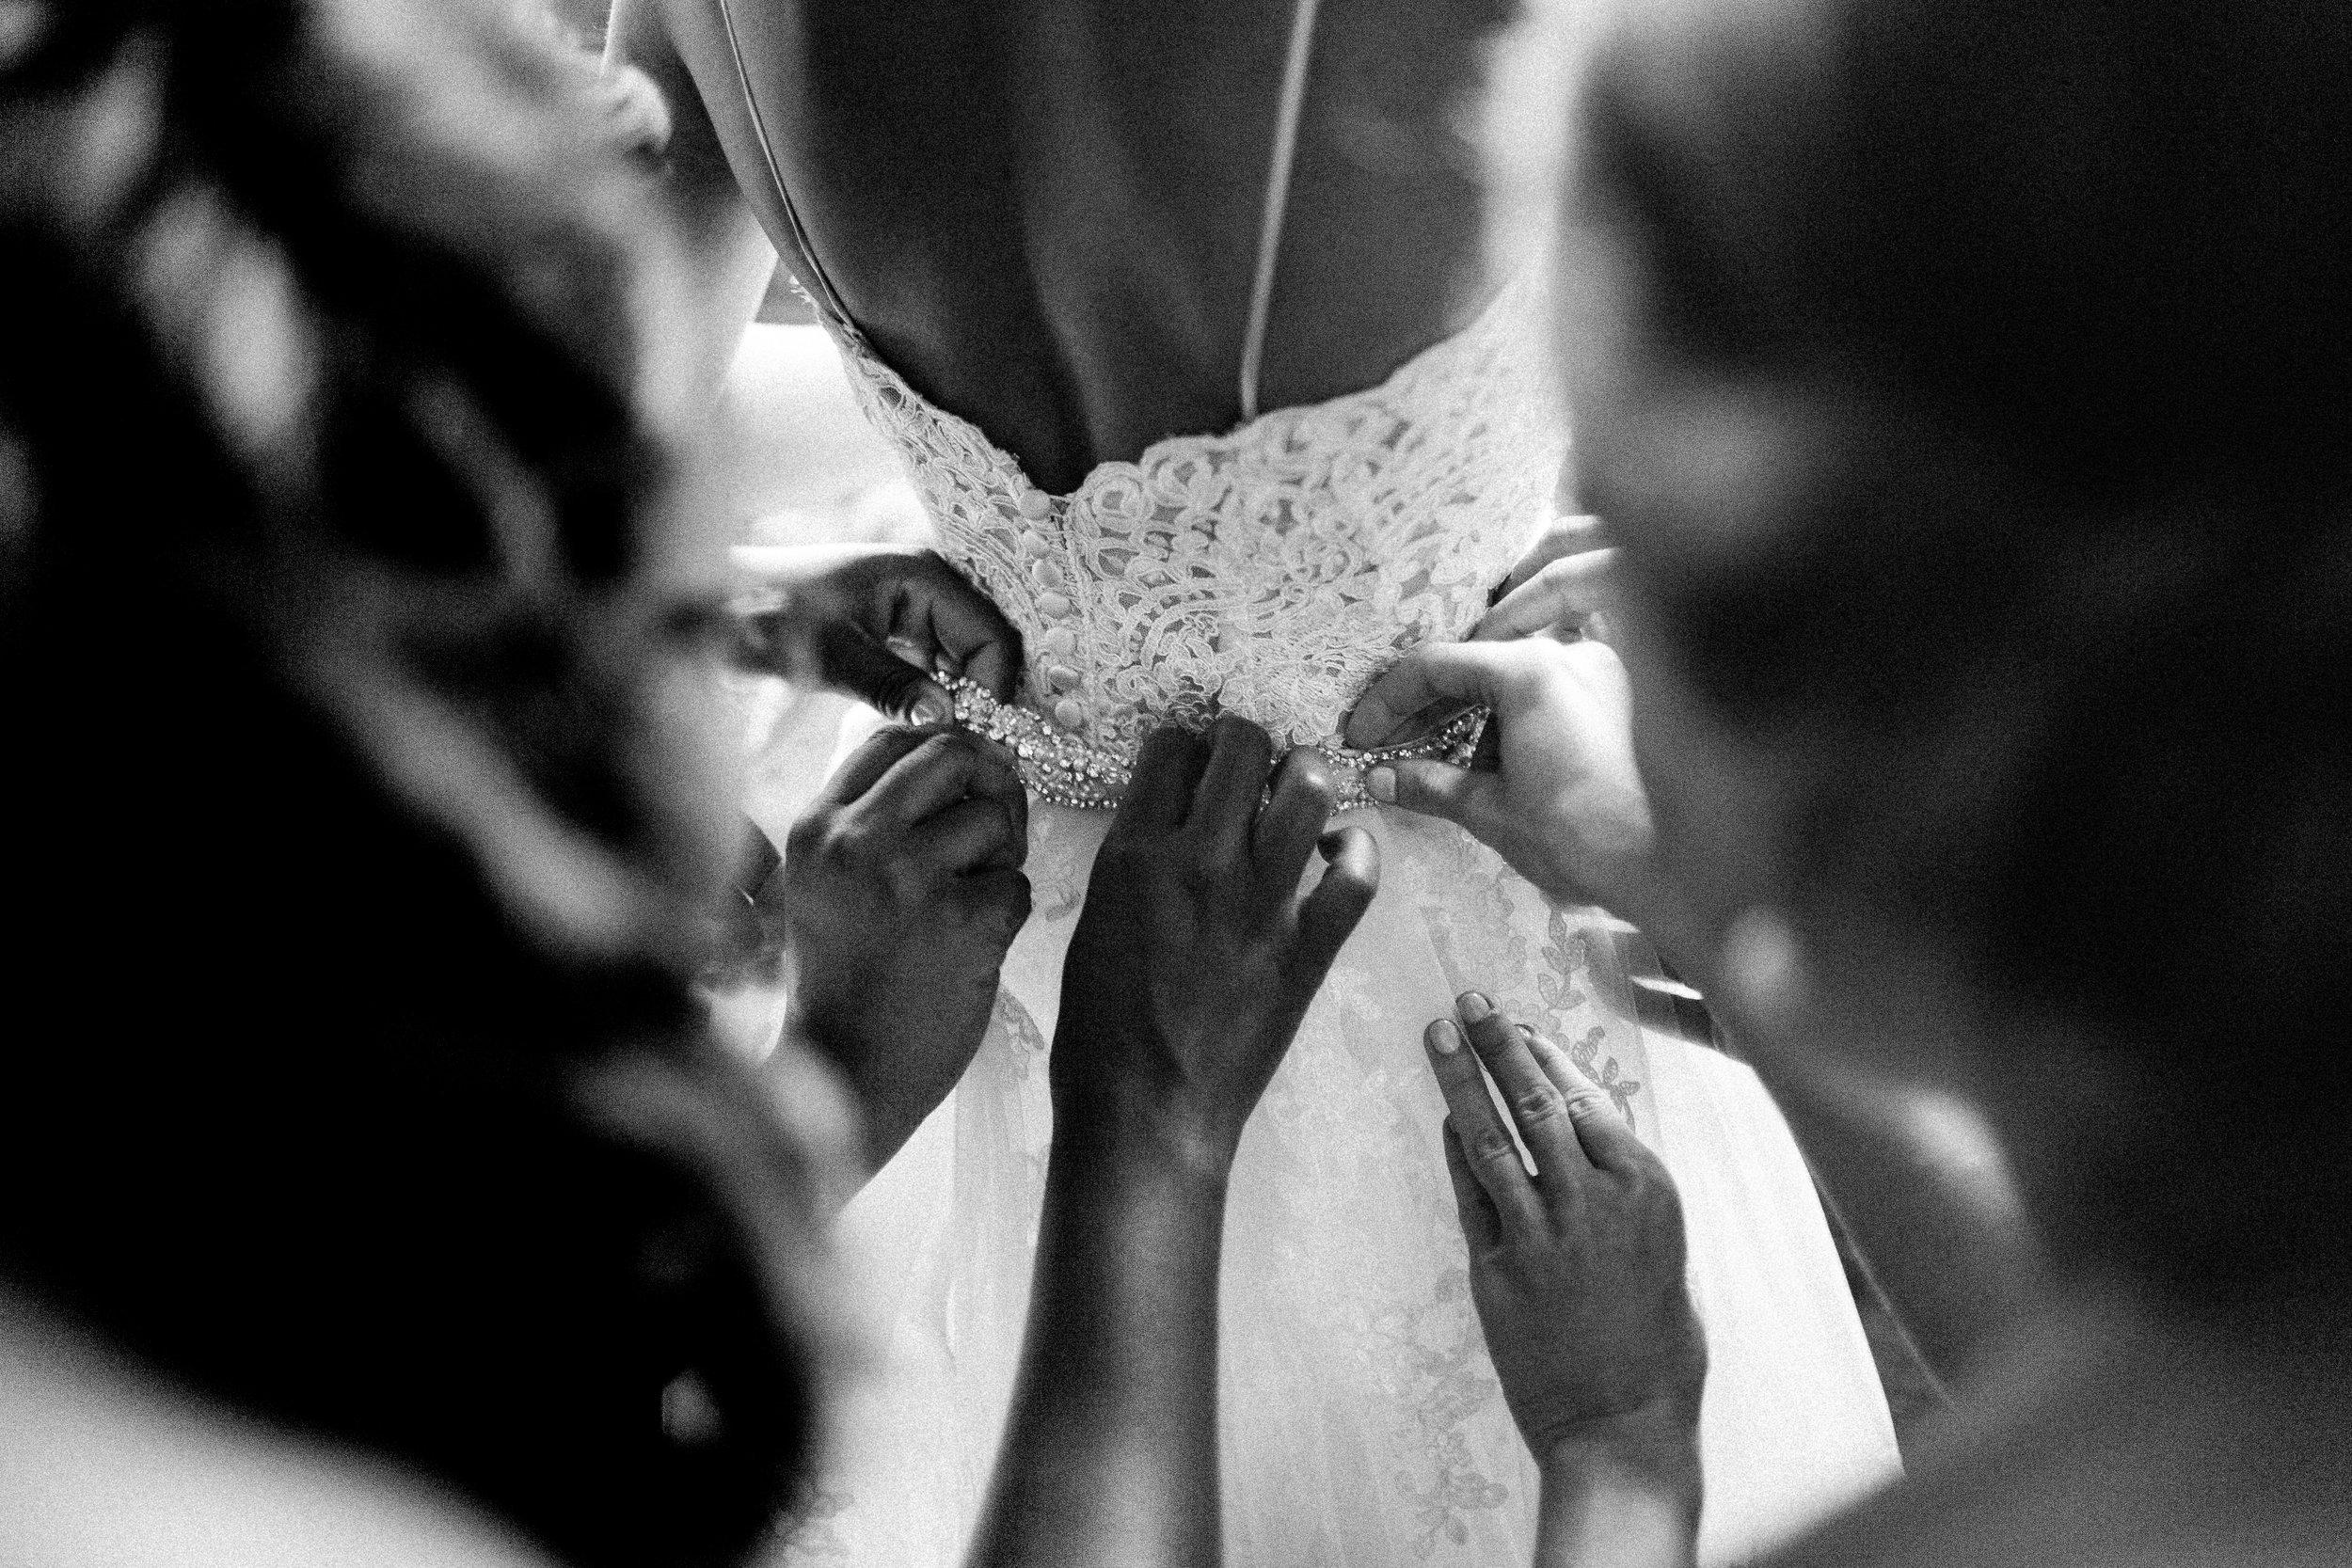 king_plow_atlanta_wedding_art_gallery_modern_lifestyle_documentary_1138.jpg